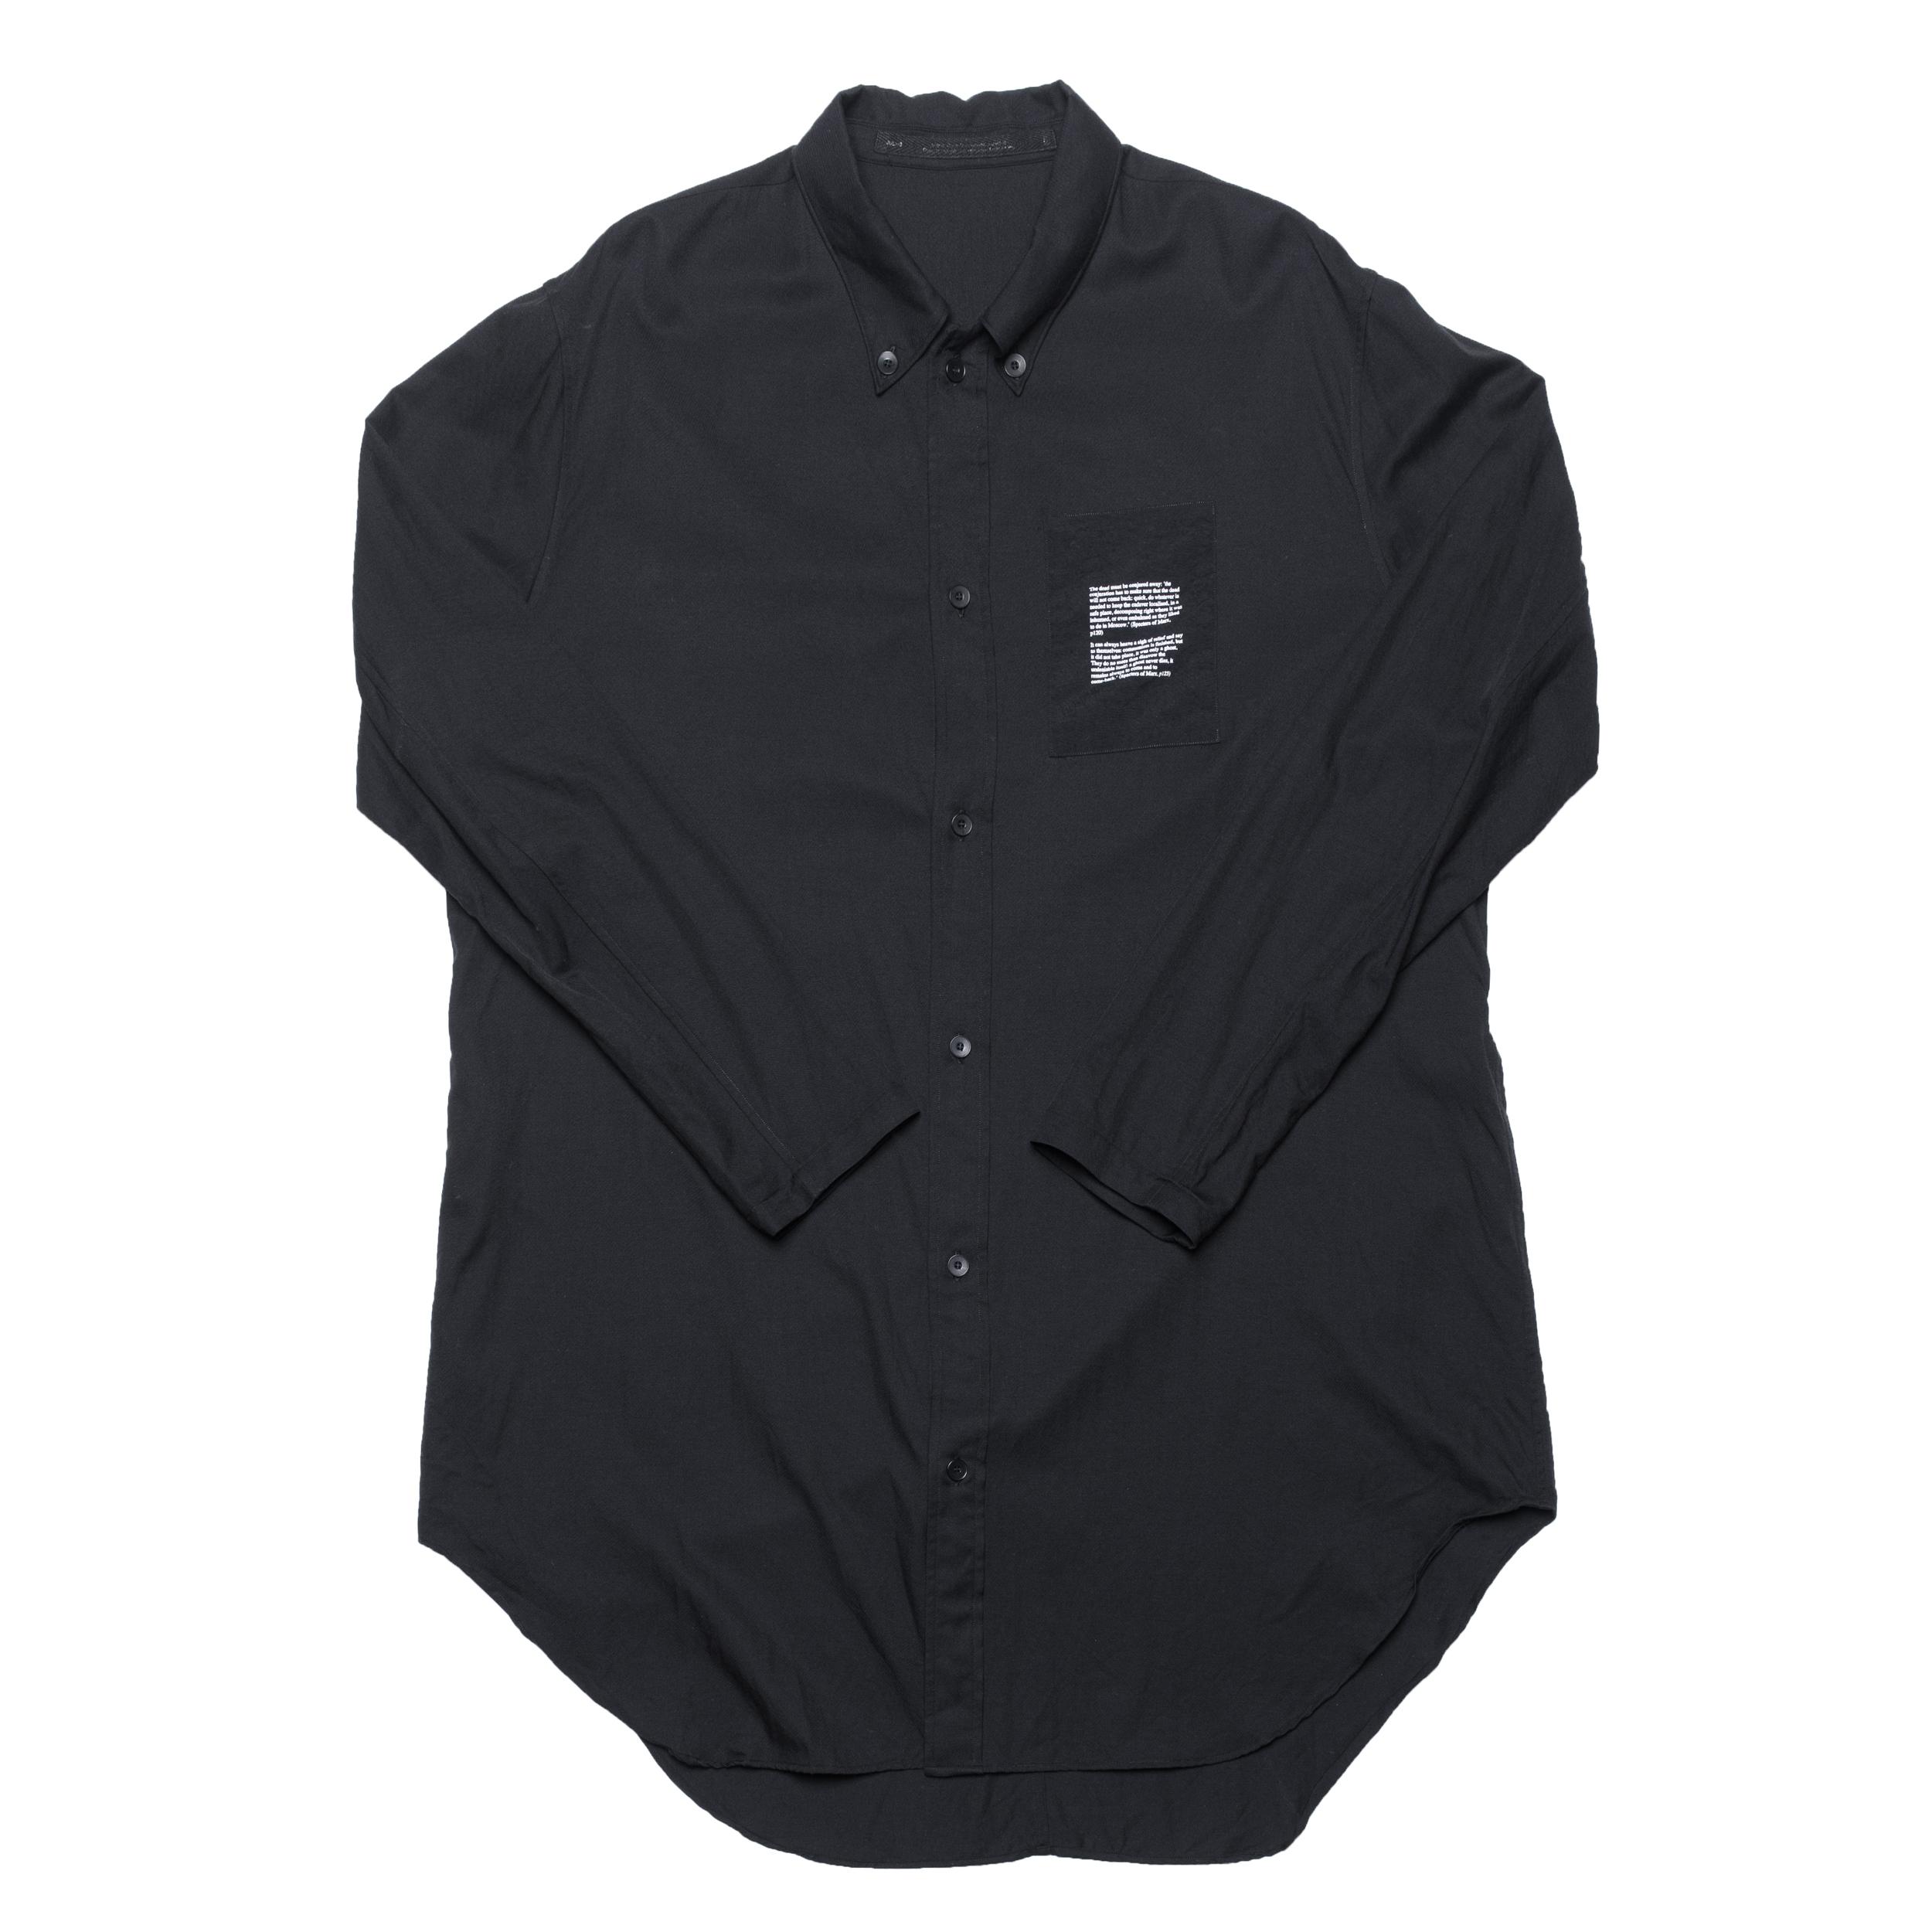 687SHM2-BLACK / ドローコードロングシャツ